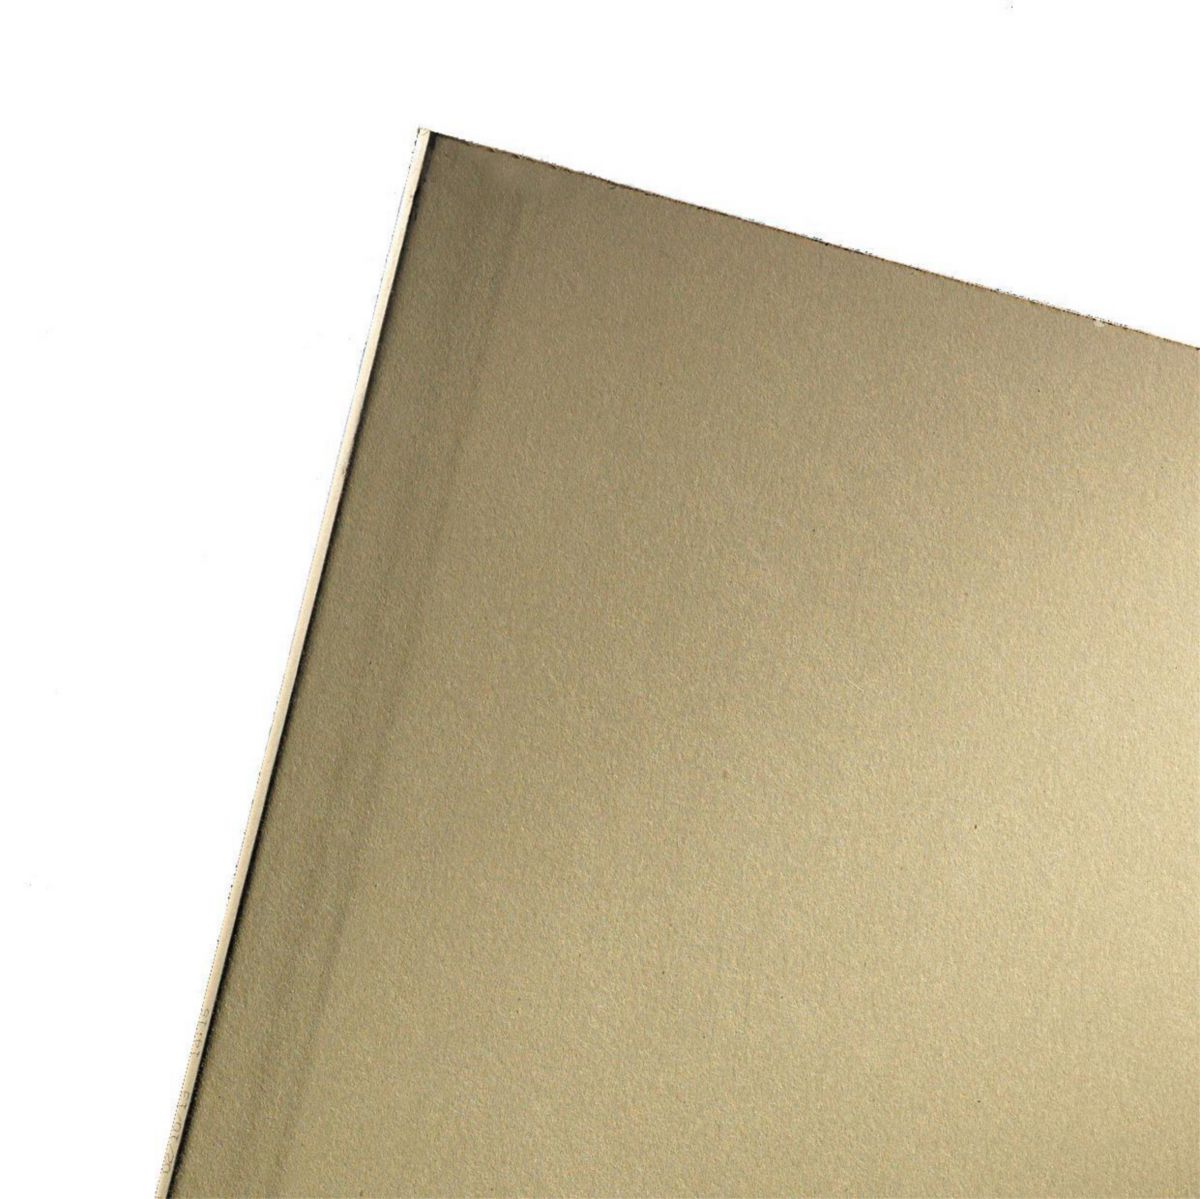 knauf plaque de pl tre knauf ba18 khd 2 5x1 2 m tr s. Black Bedroom Furniture Sets. Home Design Ideas